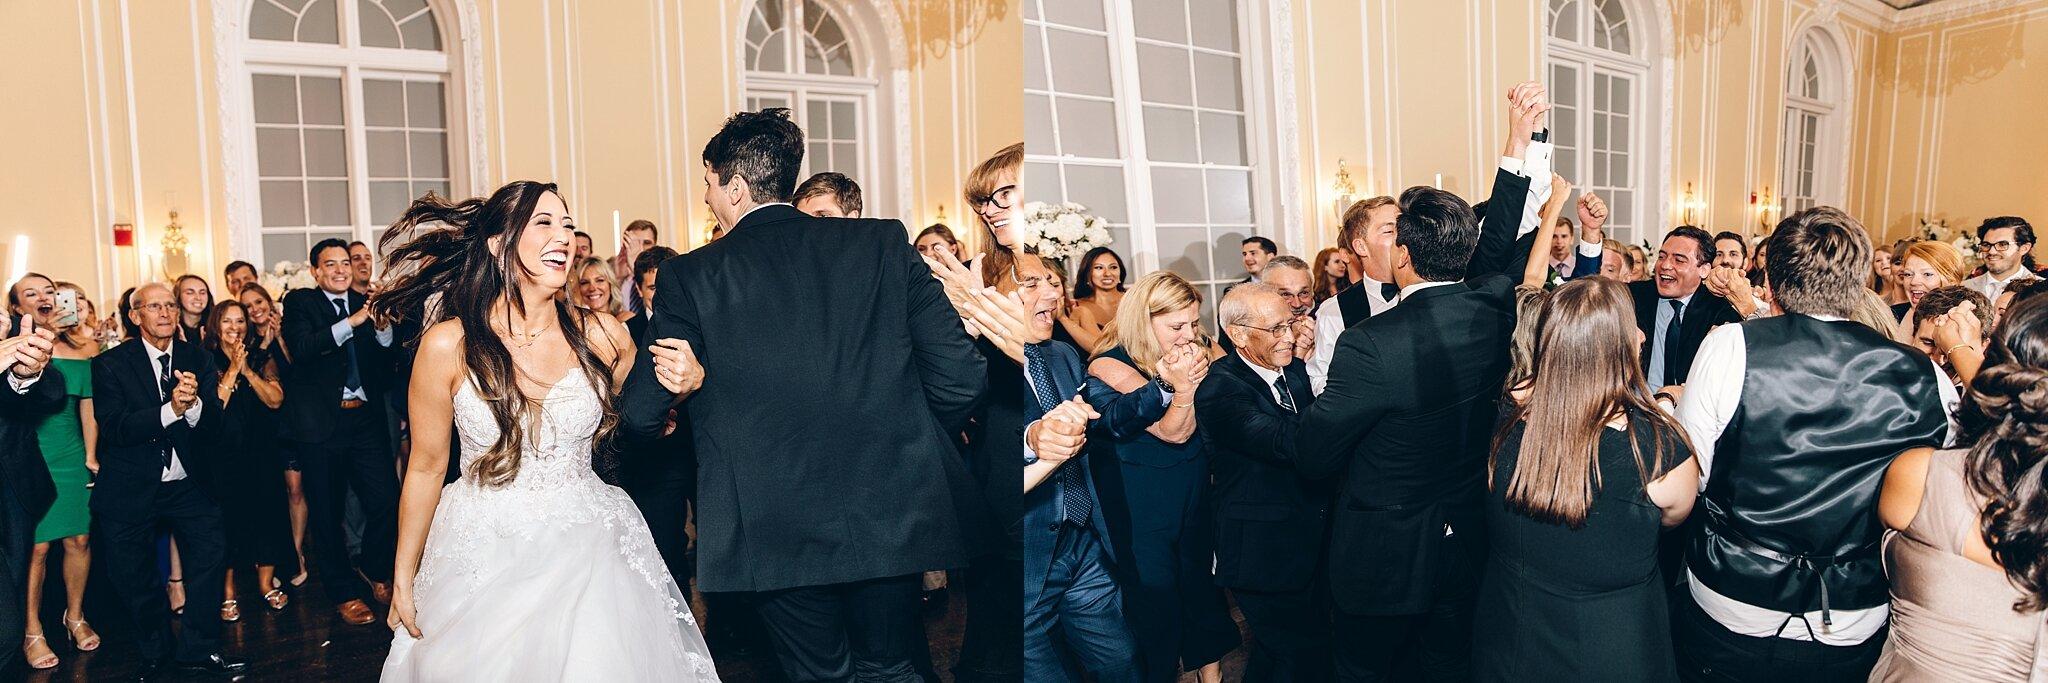 patrick-henry-ballroom-wedding-roanoke_0545.jpg